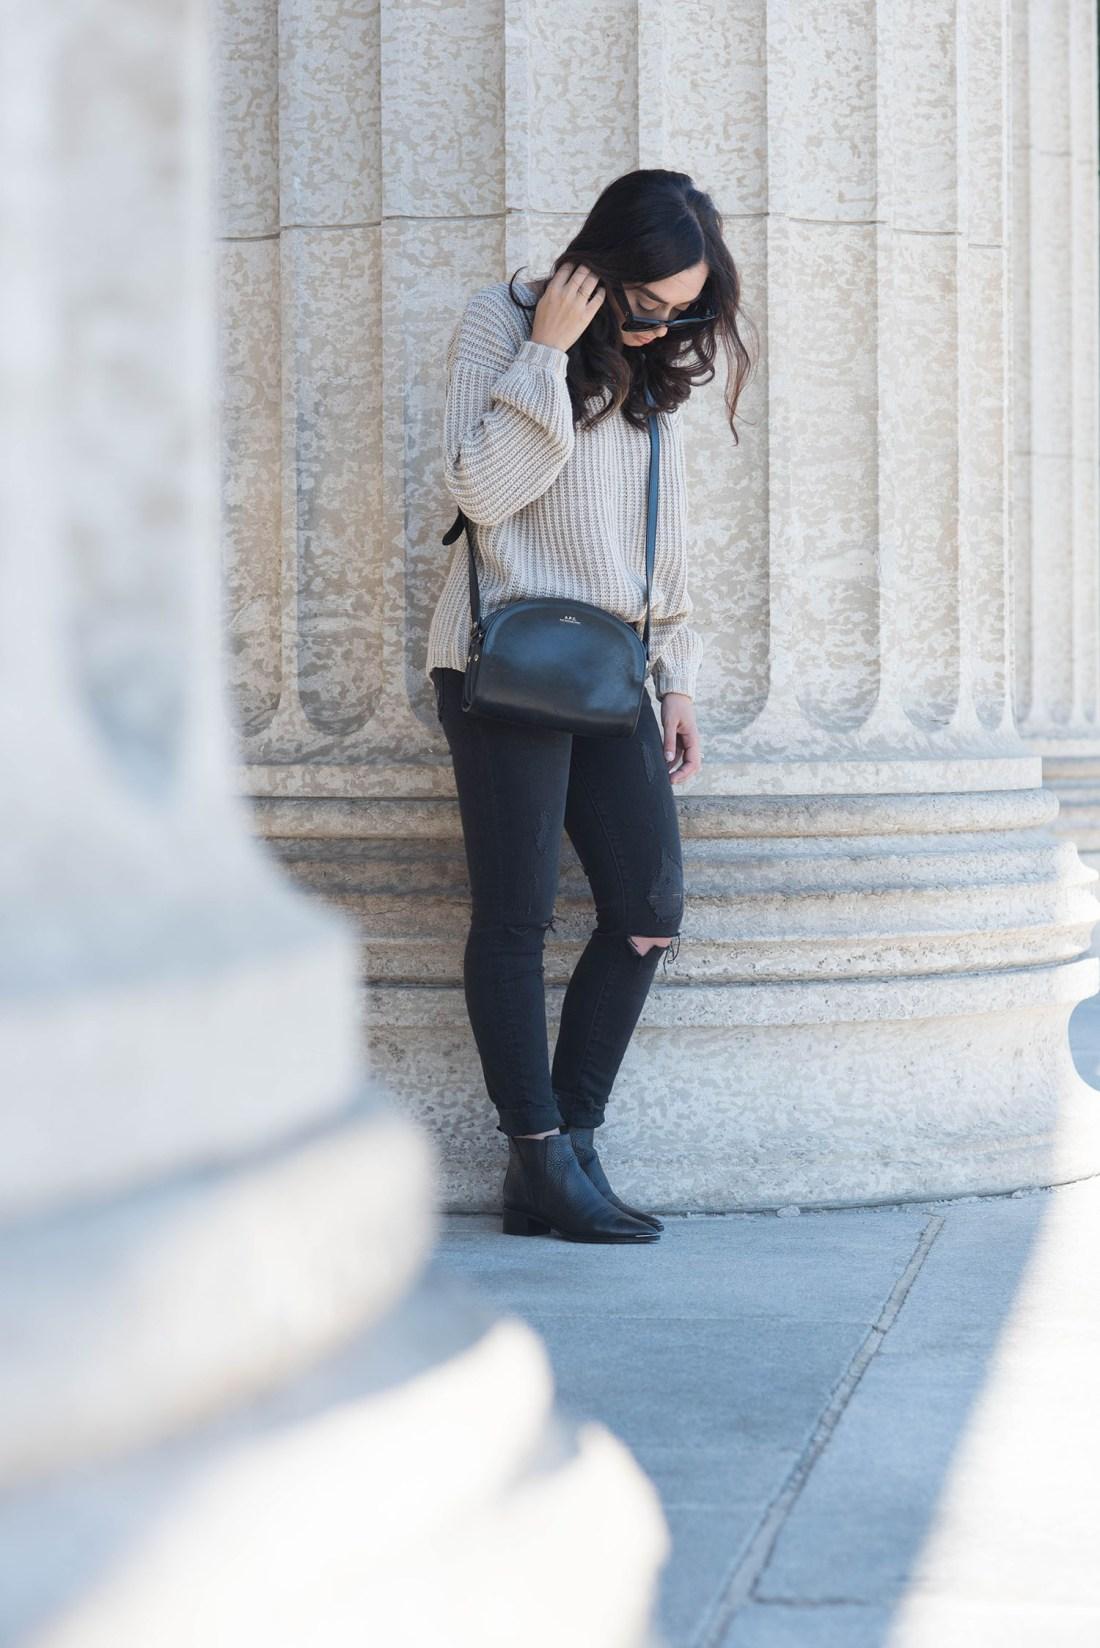 Fashion blogger Cee Fardoe of Coco & Vera wears a Tobi lace-up sweater, Acne Studios boots and APC halfmoon bag